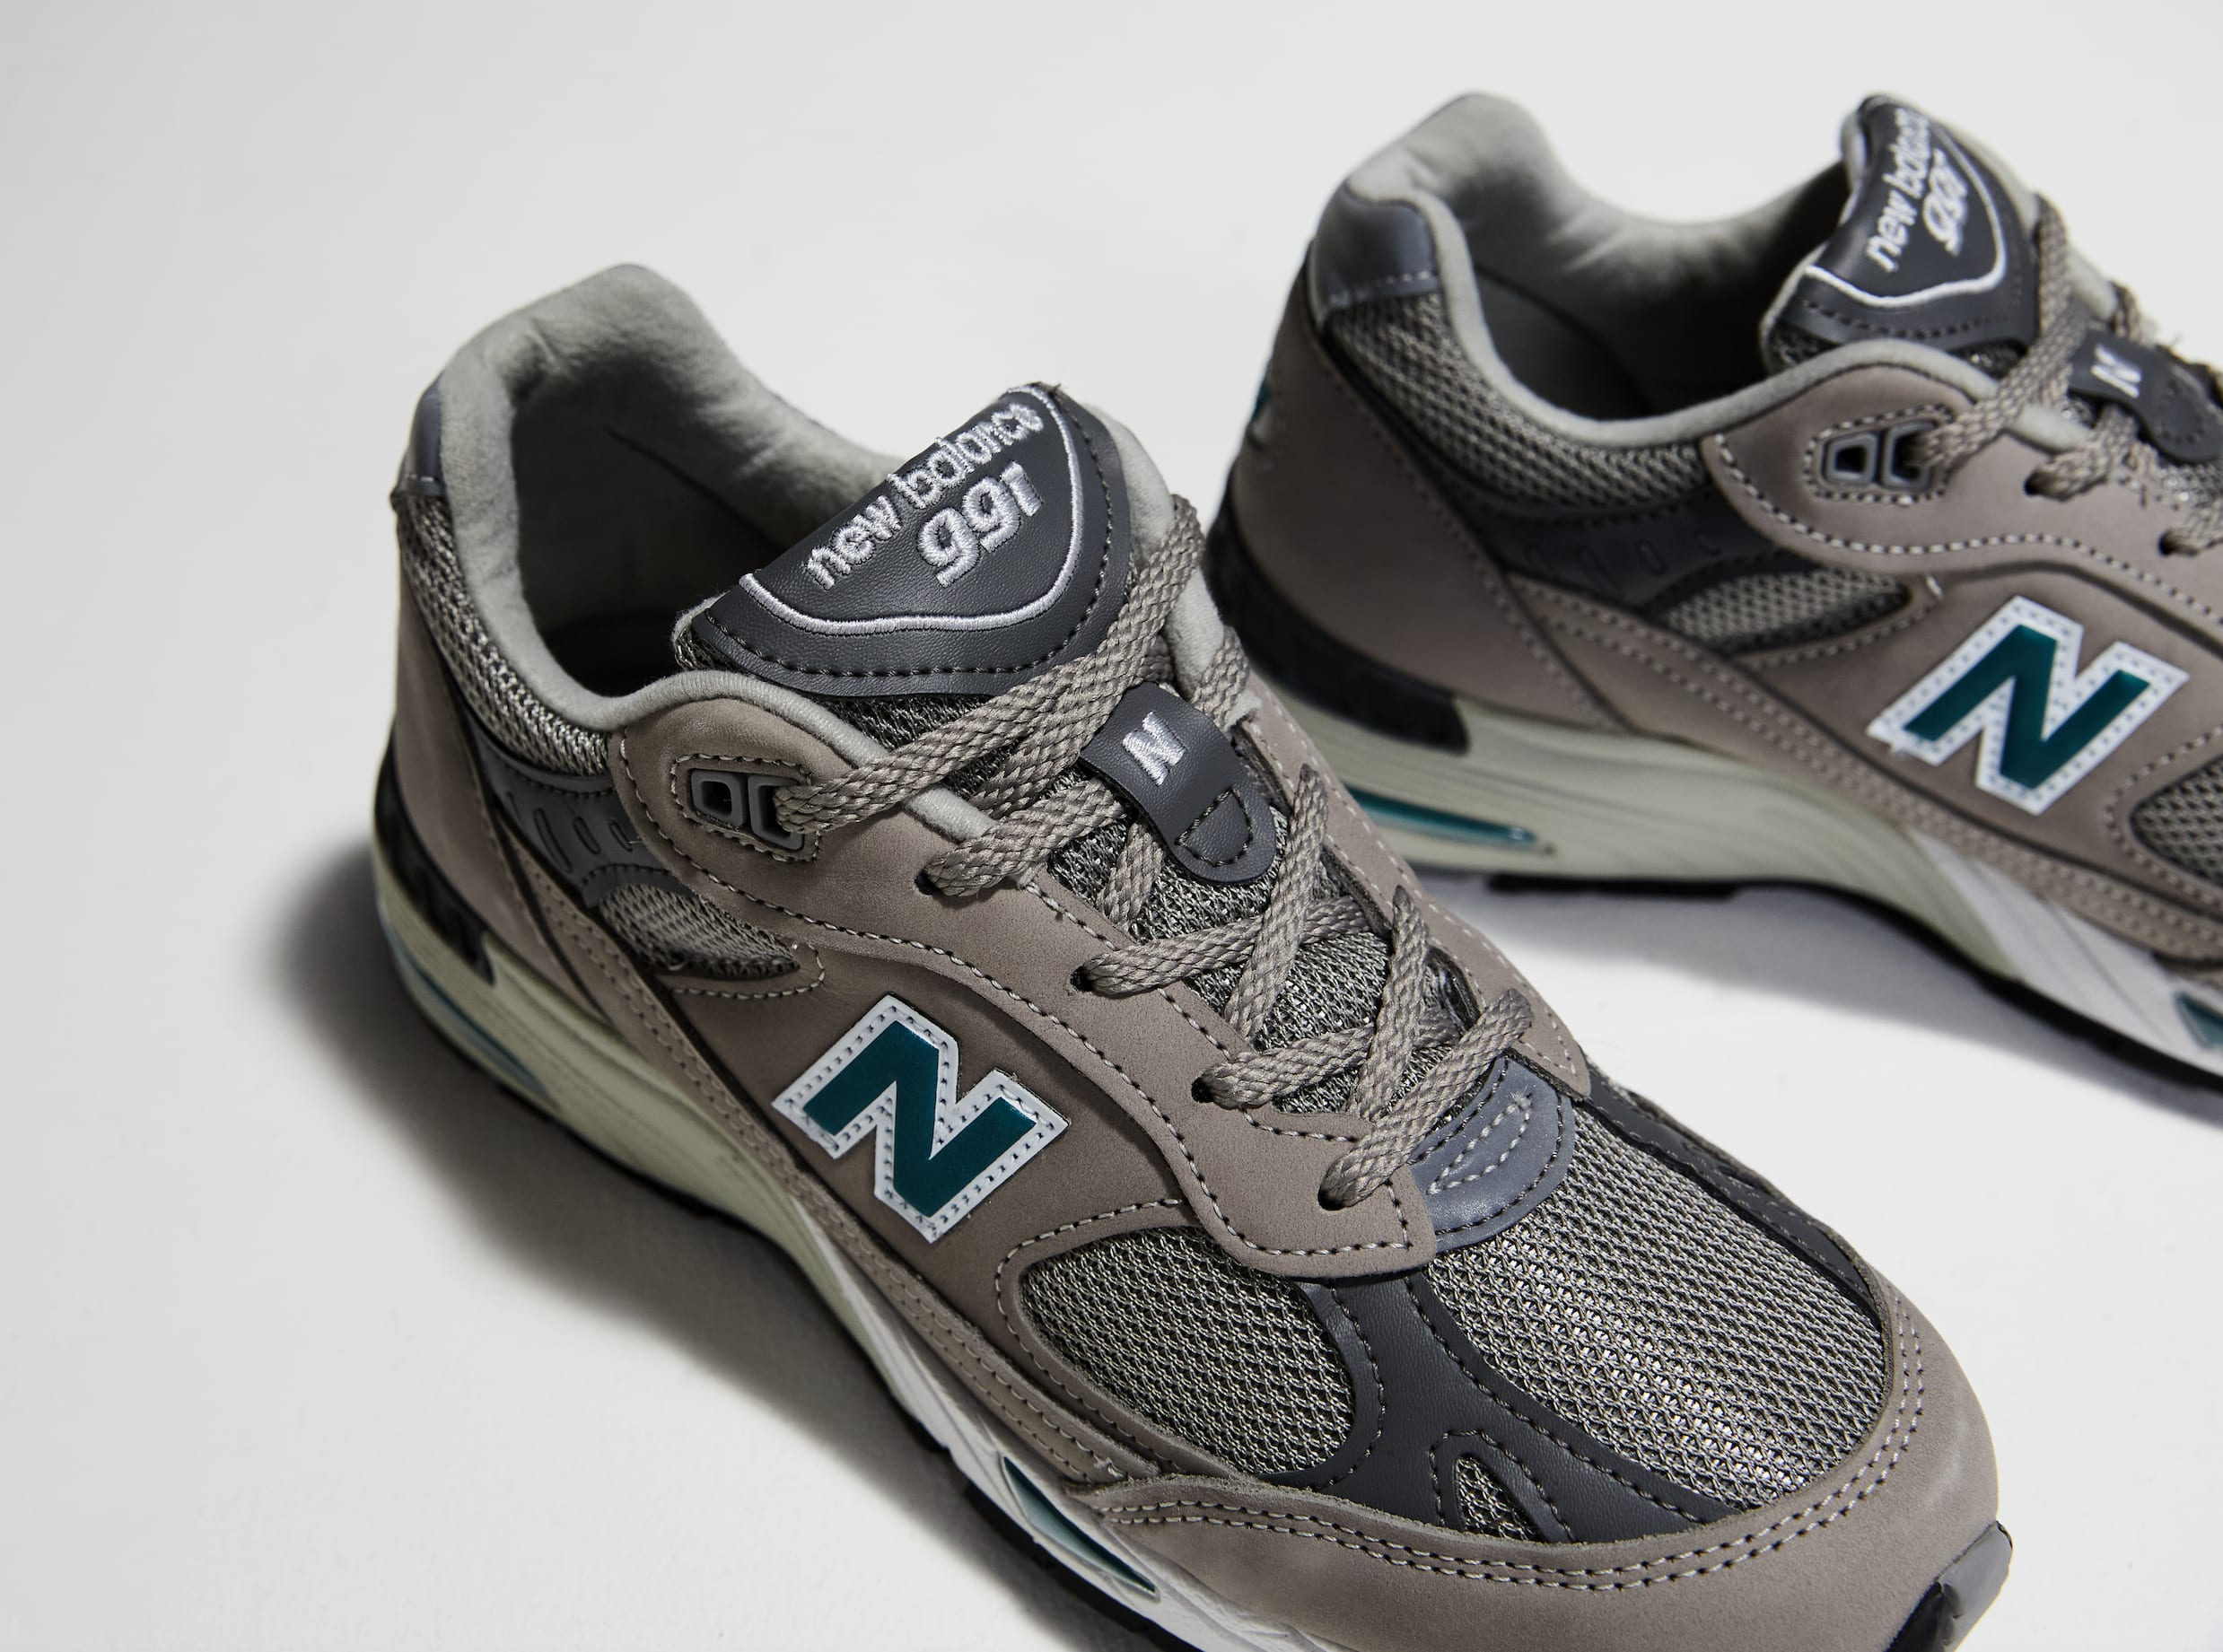 New Balance 991 '20th Anniversary' Top